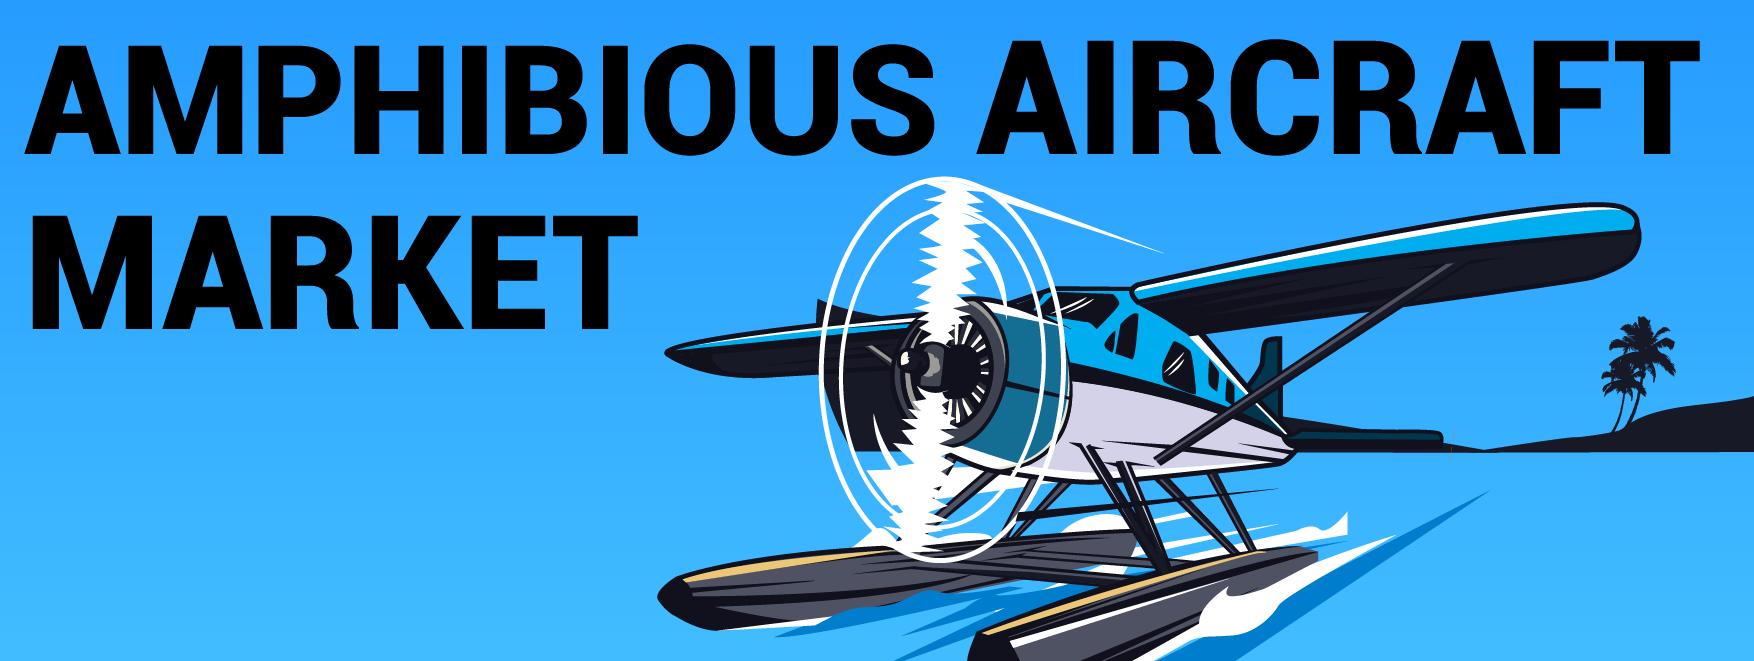 Amphibious Aircraft Market